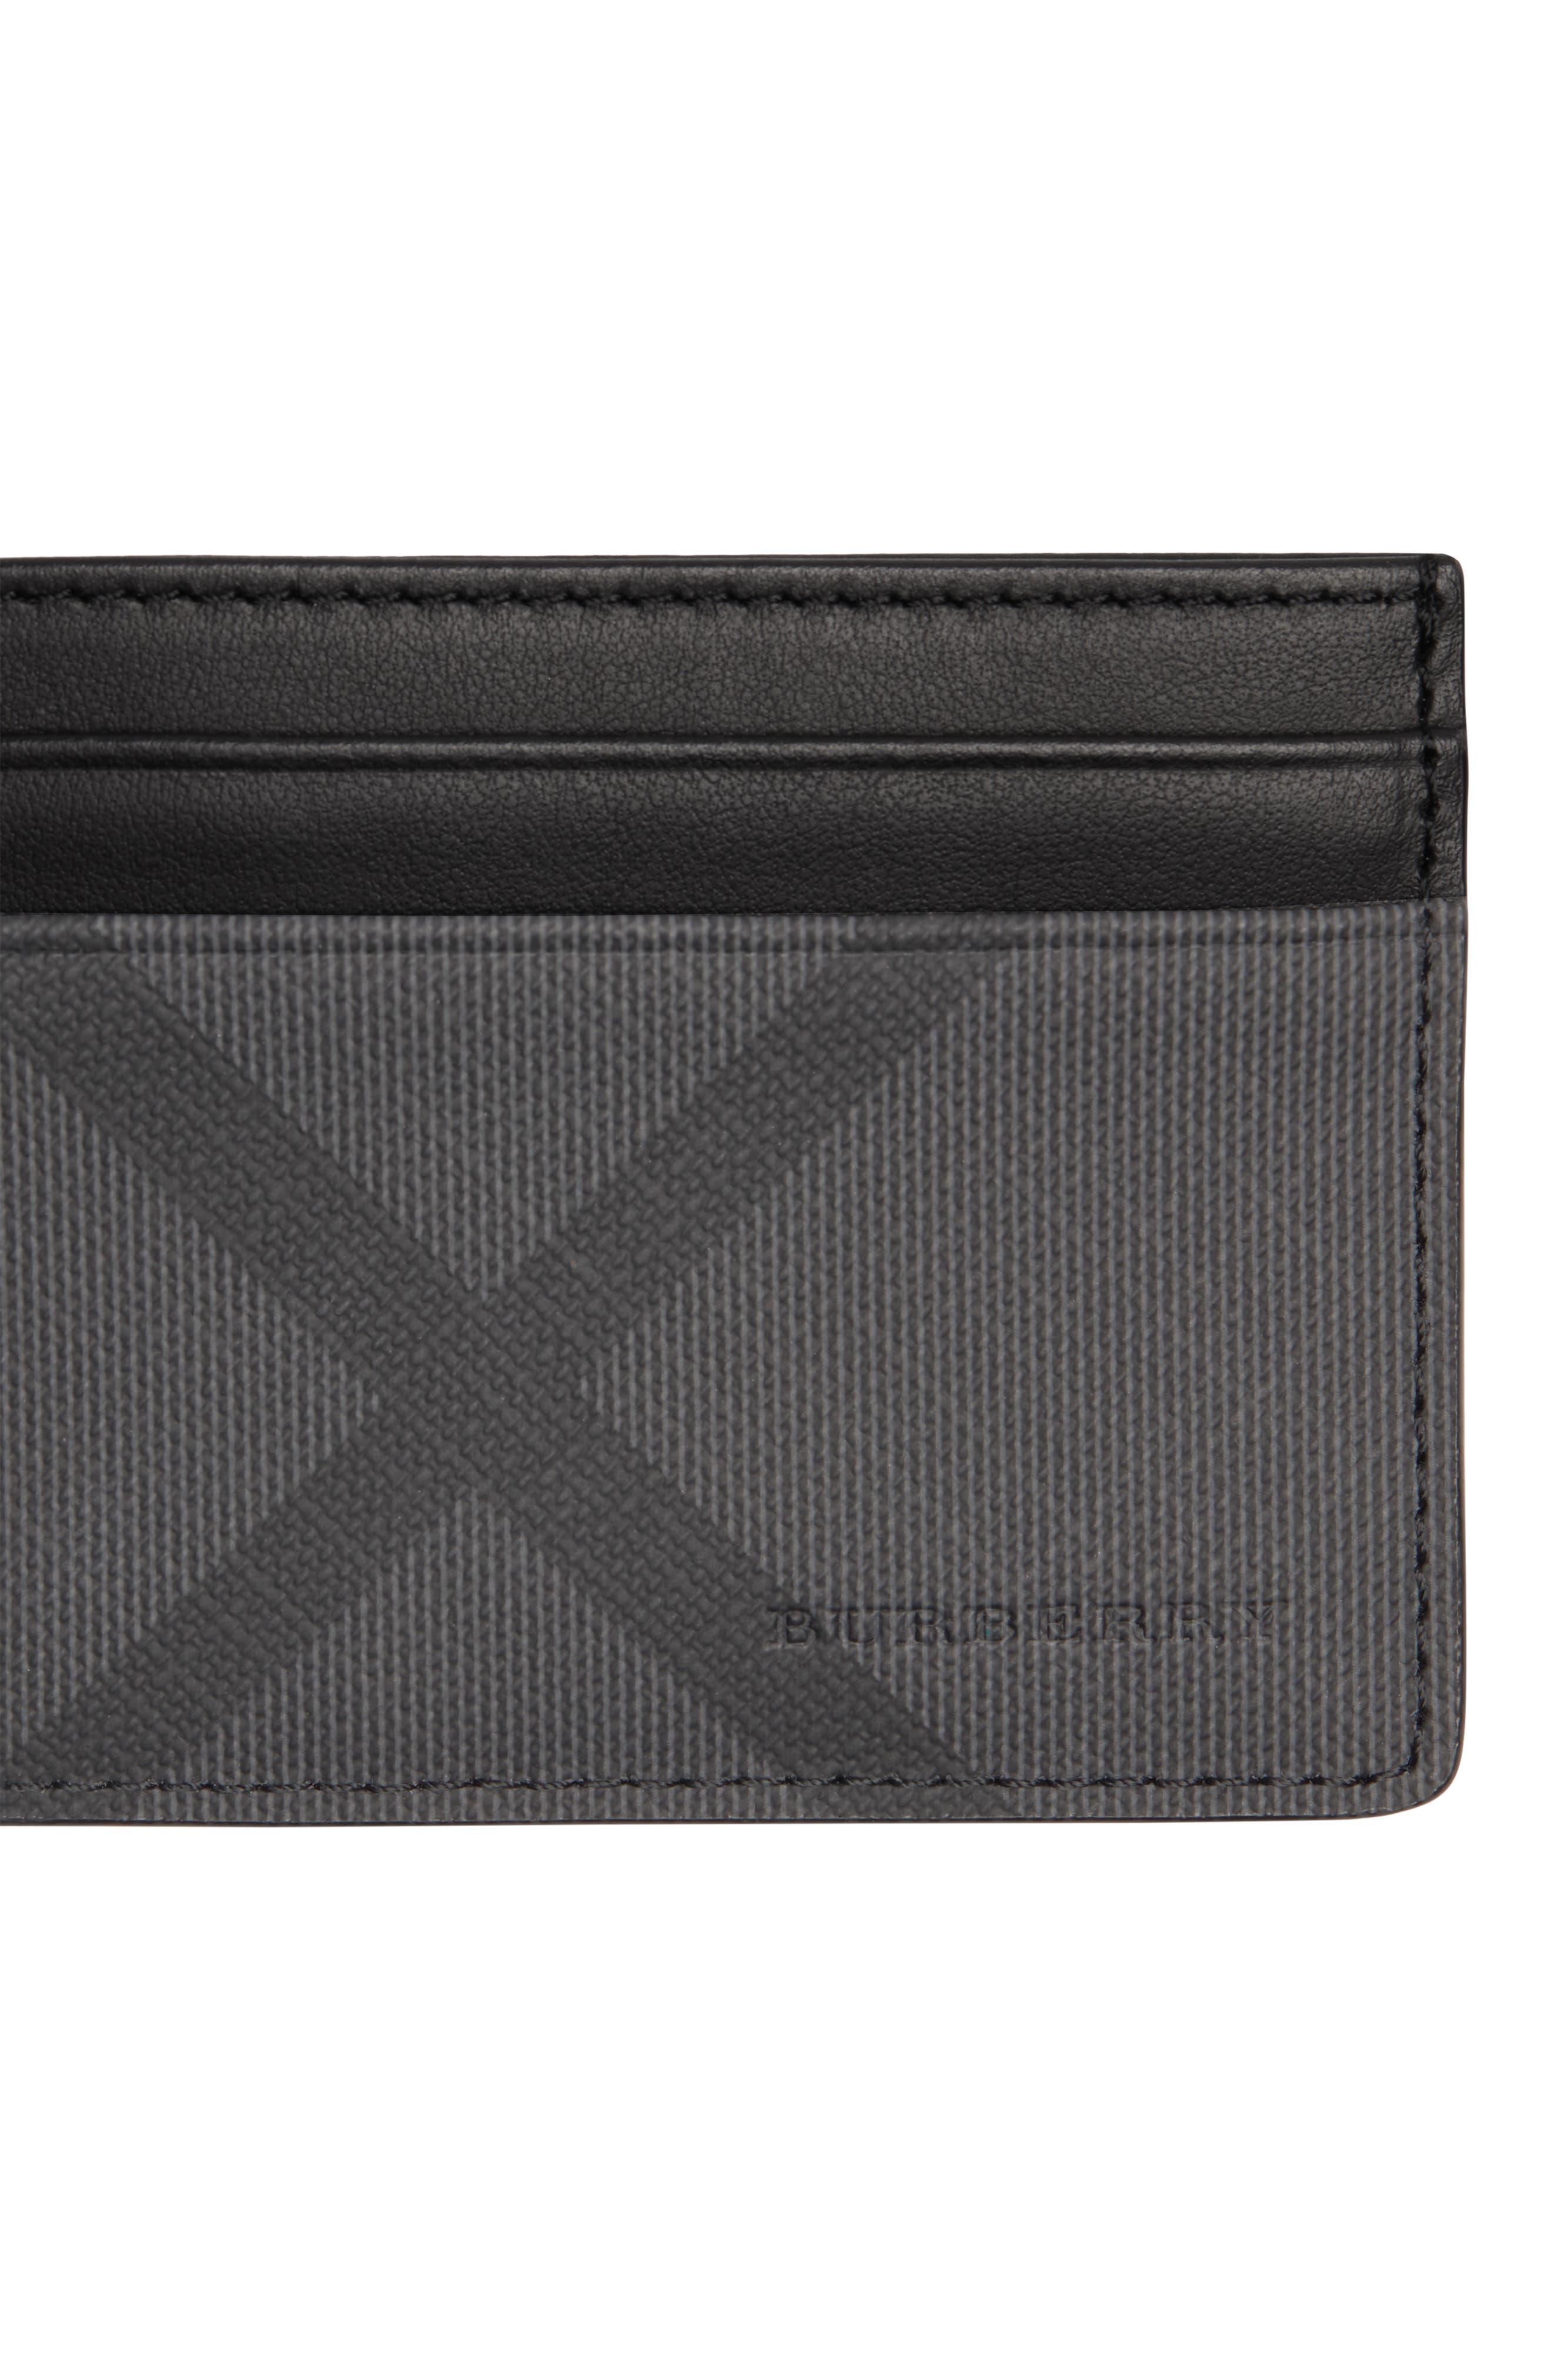 BURBERRY, Sandon Card Case, Alternate thumbnail 4, color, CHARCOAL/ BLACK